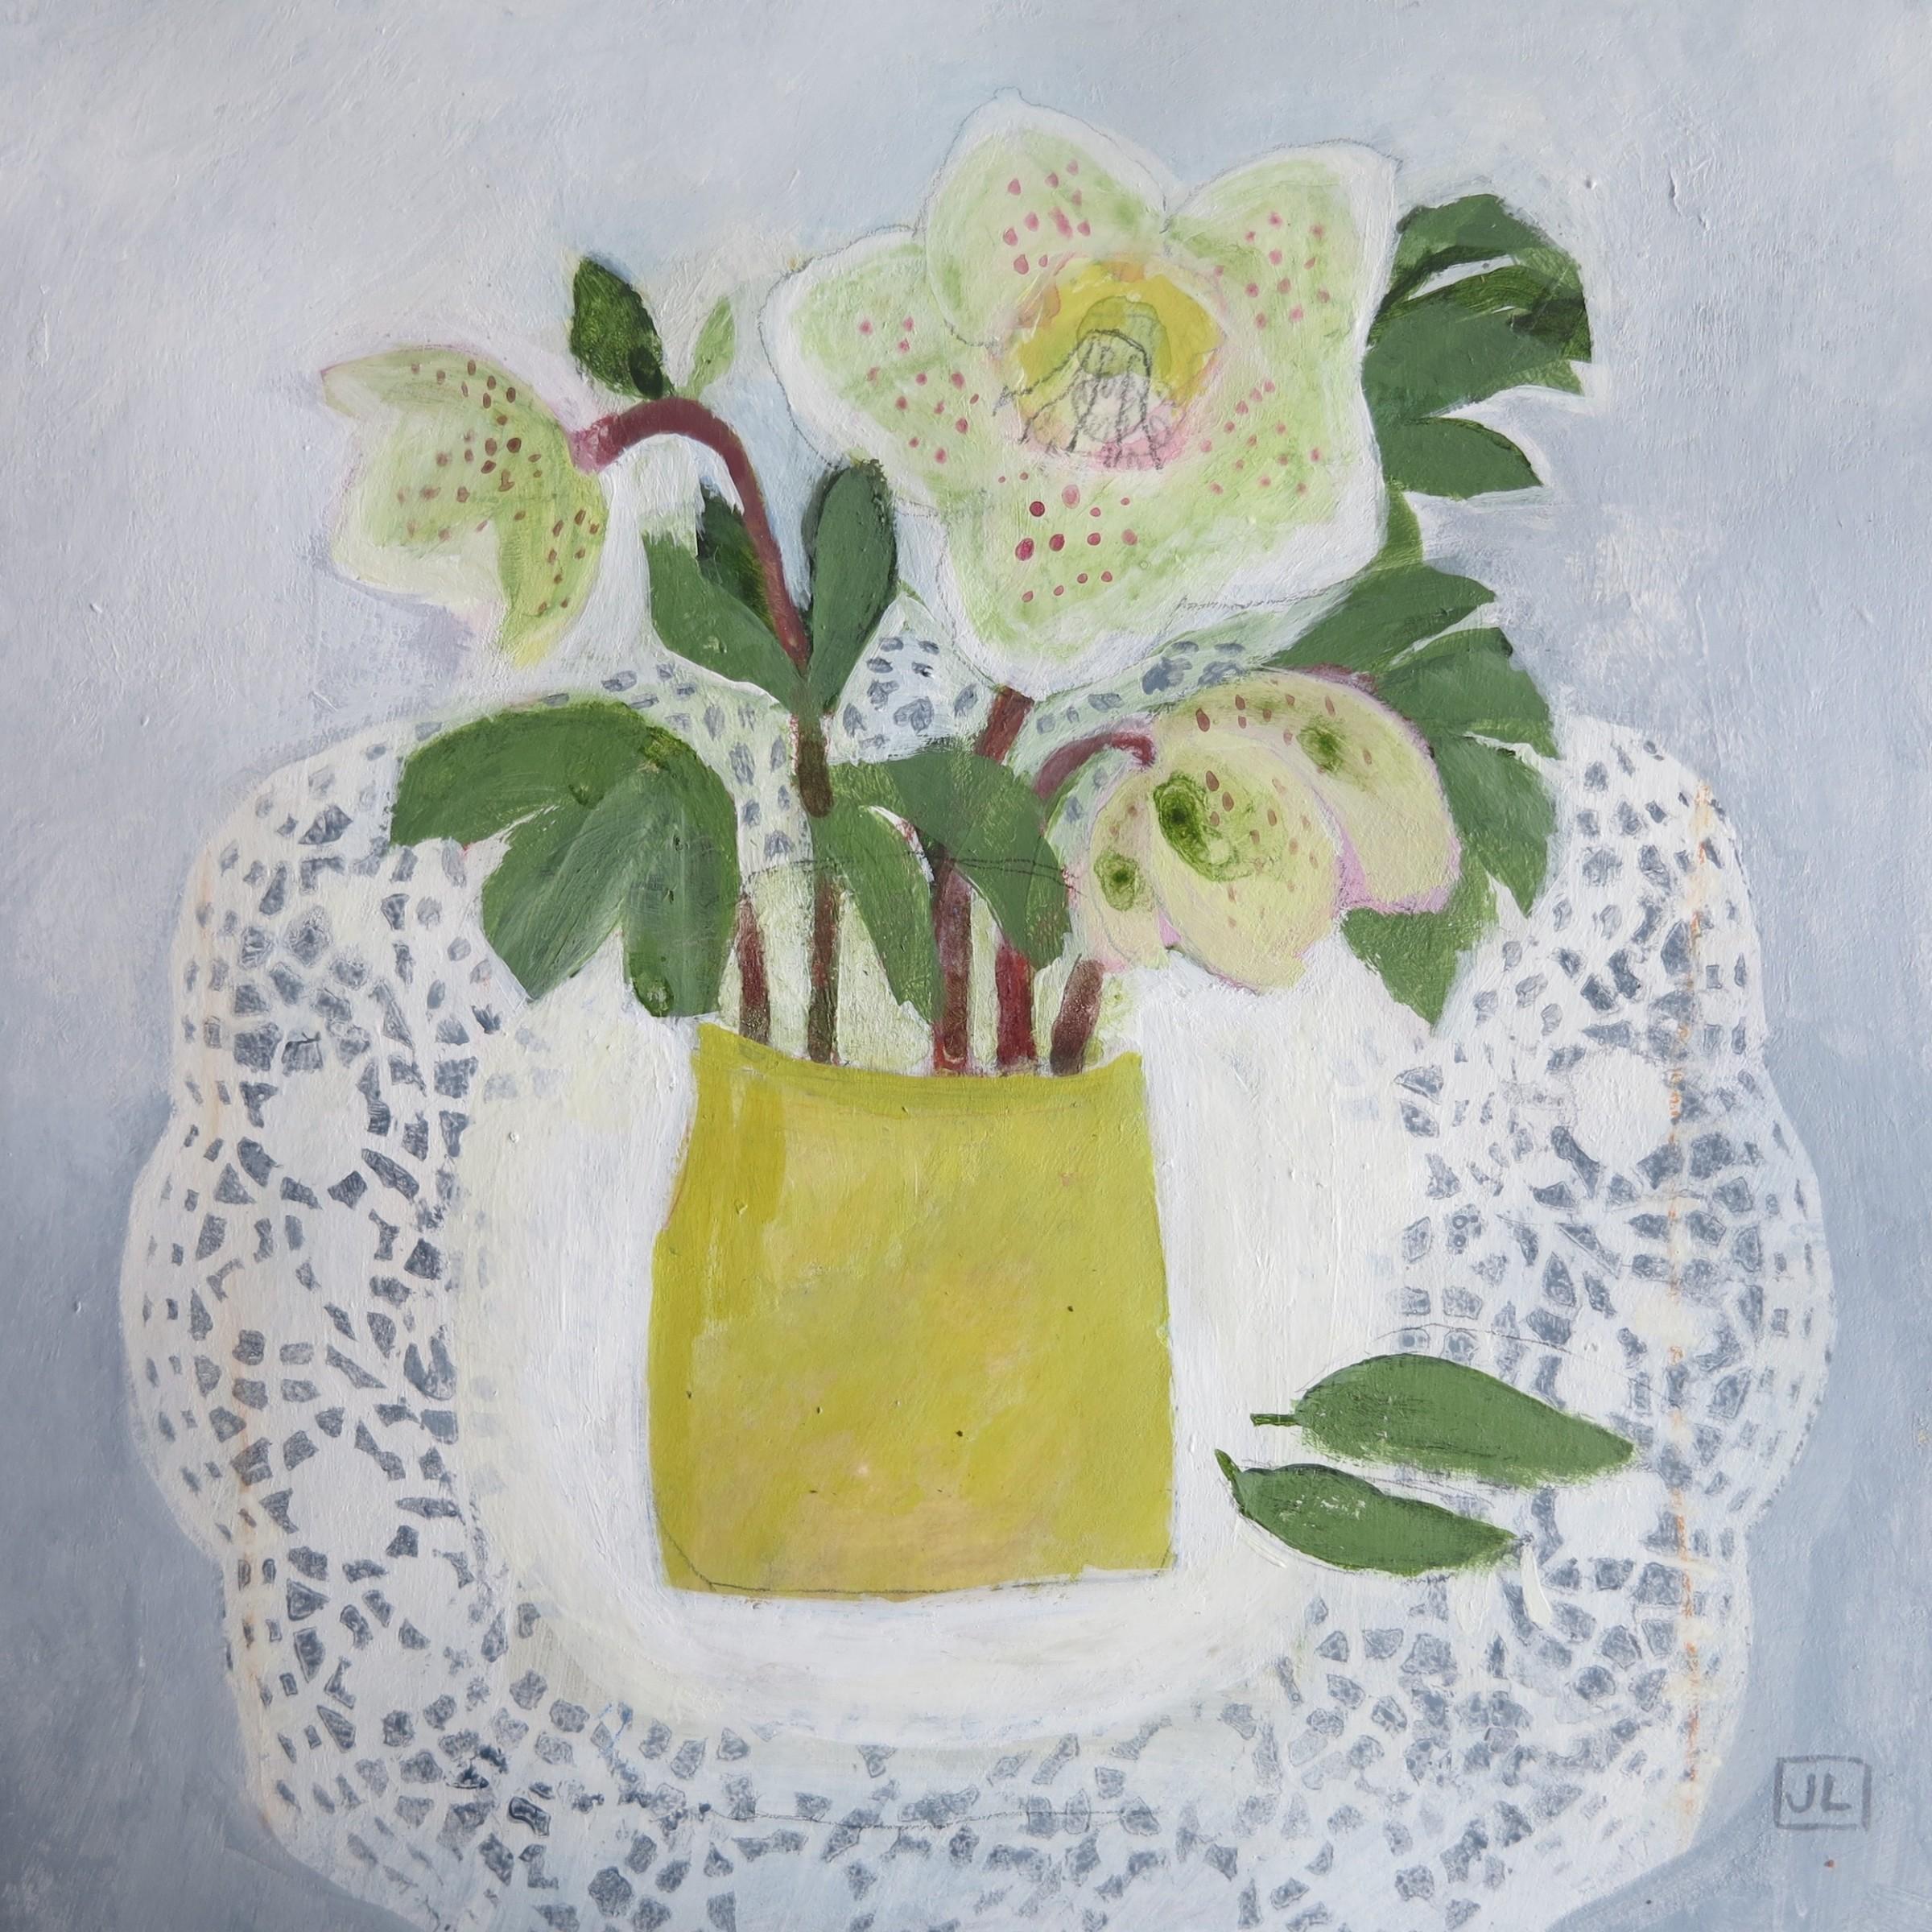 <span class=&#34;link fancybox-details-link&#34;><a href=&#34;/exhibitions/24/works/artworks_standalone10728/&#34;>View Detail Page</a></span><div class=&#34;artist&#34;><span class=&#34;artist&#34;><strong>Jill Leman</strong></span></div><div class=&#34;title&#34;><em>Spring is on the Way</em></div><div class=&#34;medium&#34;>watercolour & acrylic</div><div class=&#34;dimensions&#34;>32.5x32cm</div>